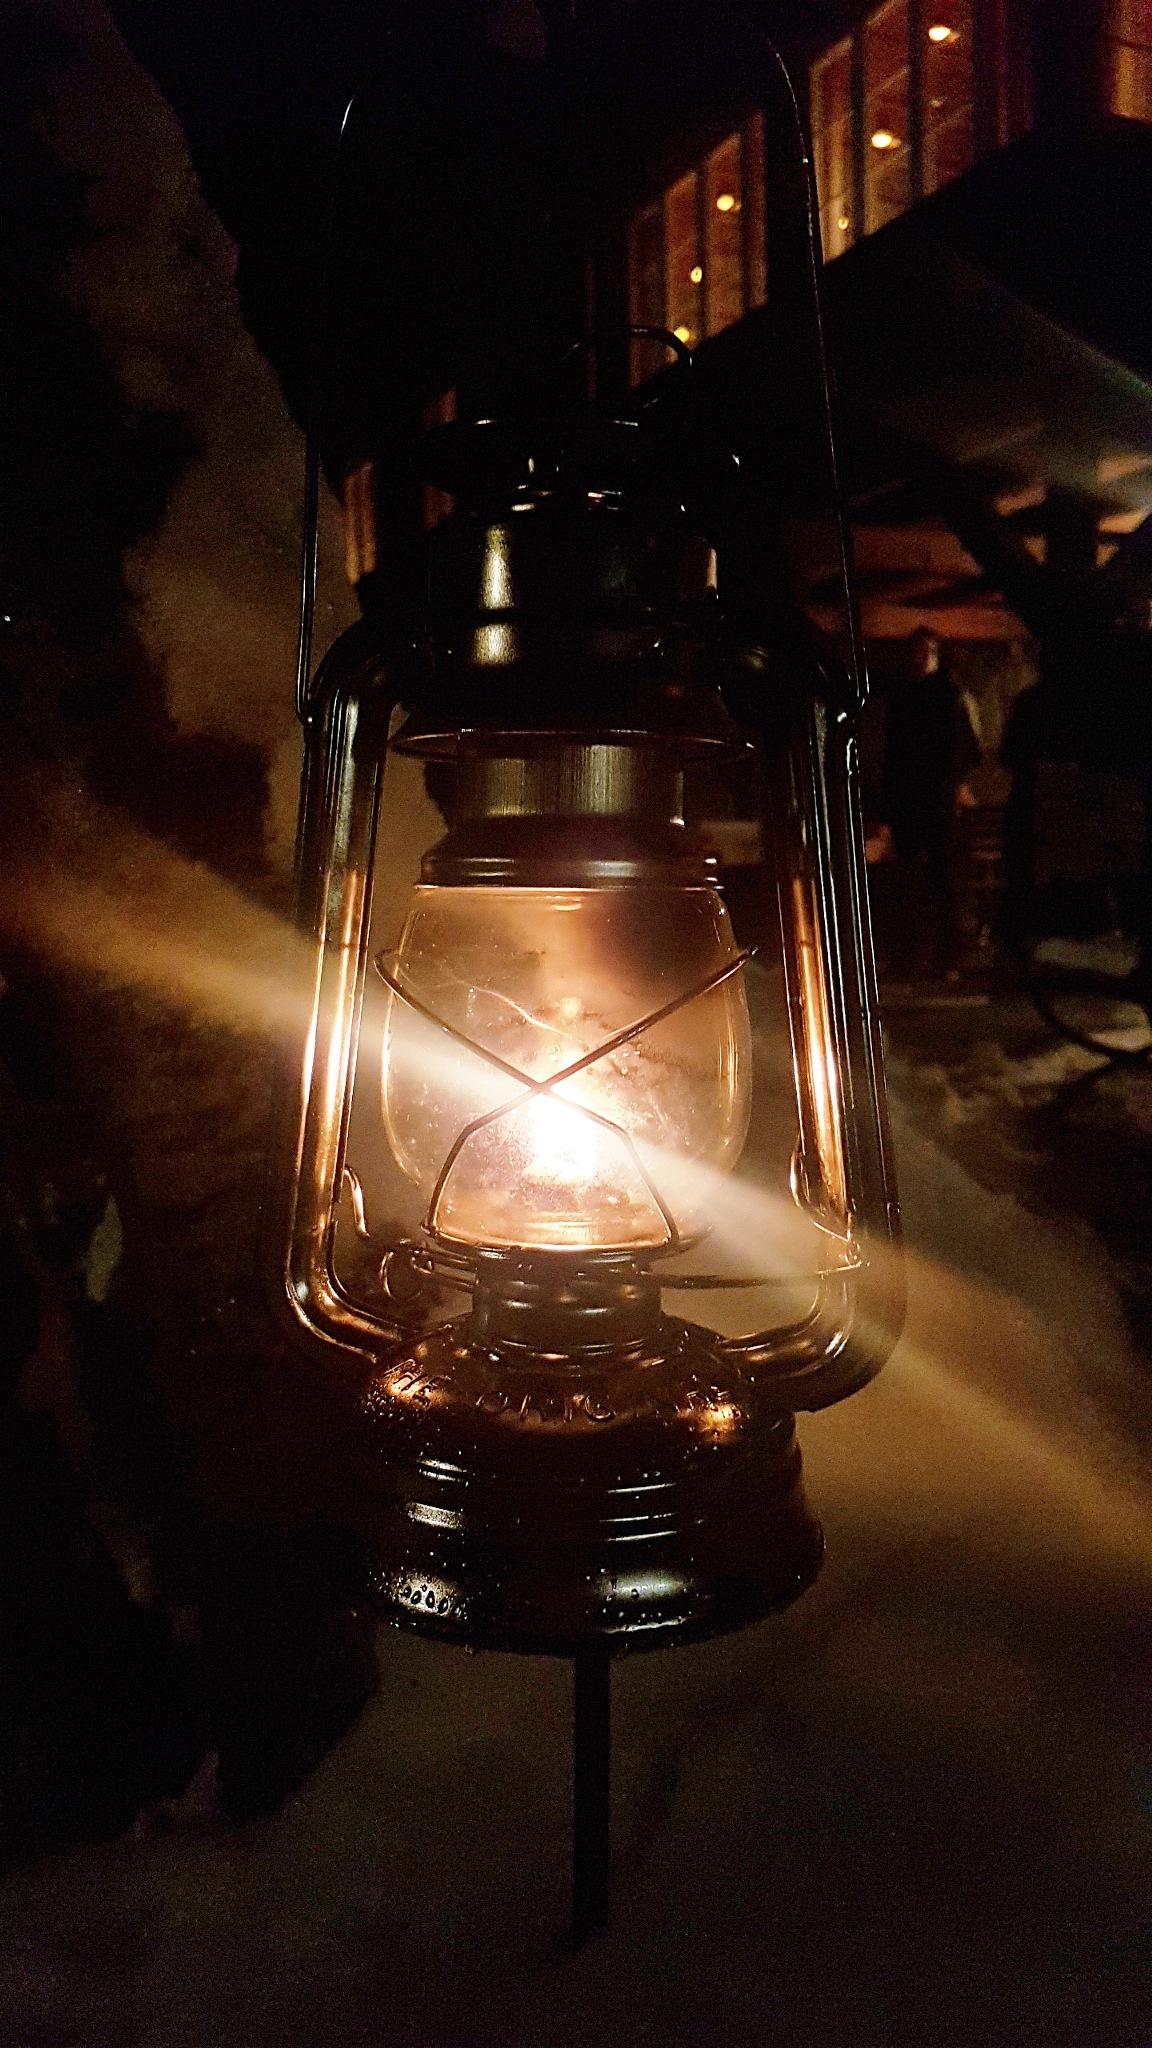 Lantern at night by Maximilian Ludwig